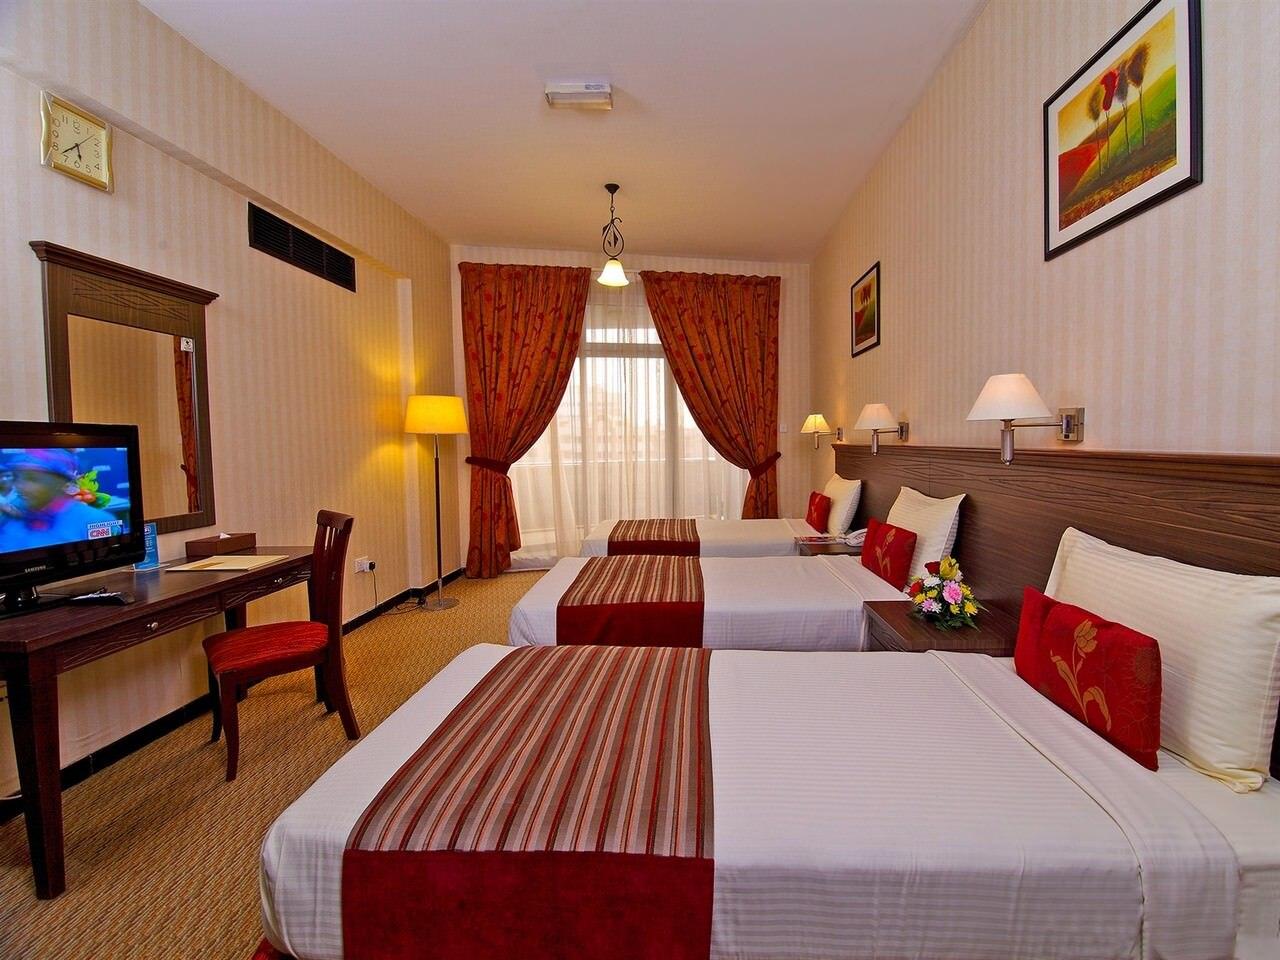 Florida-Intl-Hotel-Standard-Triple-2